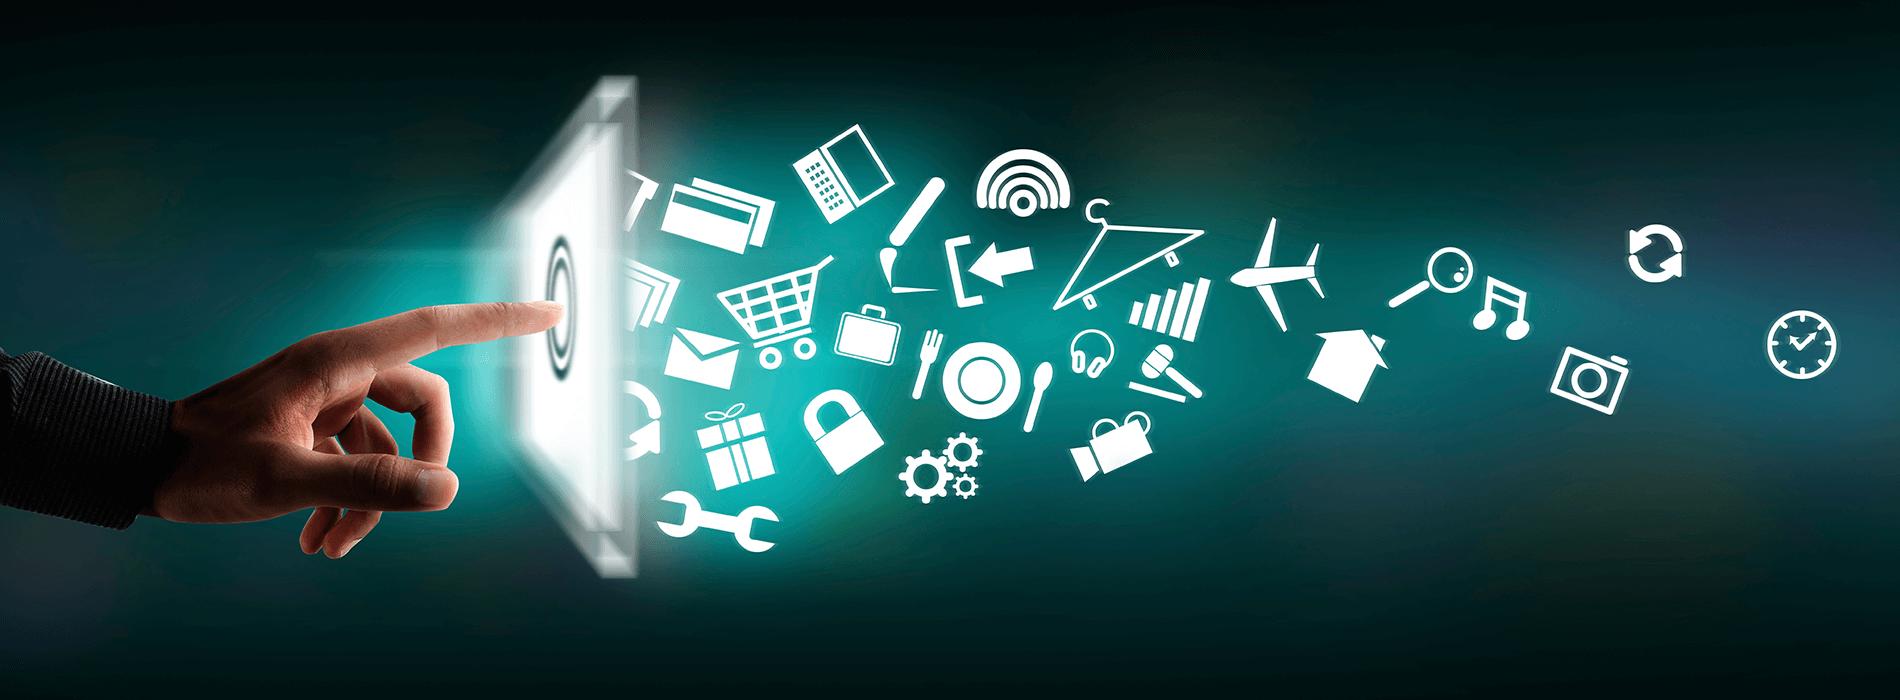 Saber Data Photo: Software Development & IT Solutions